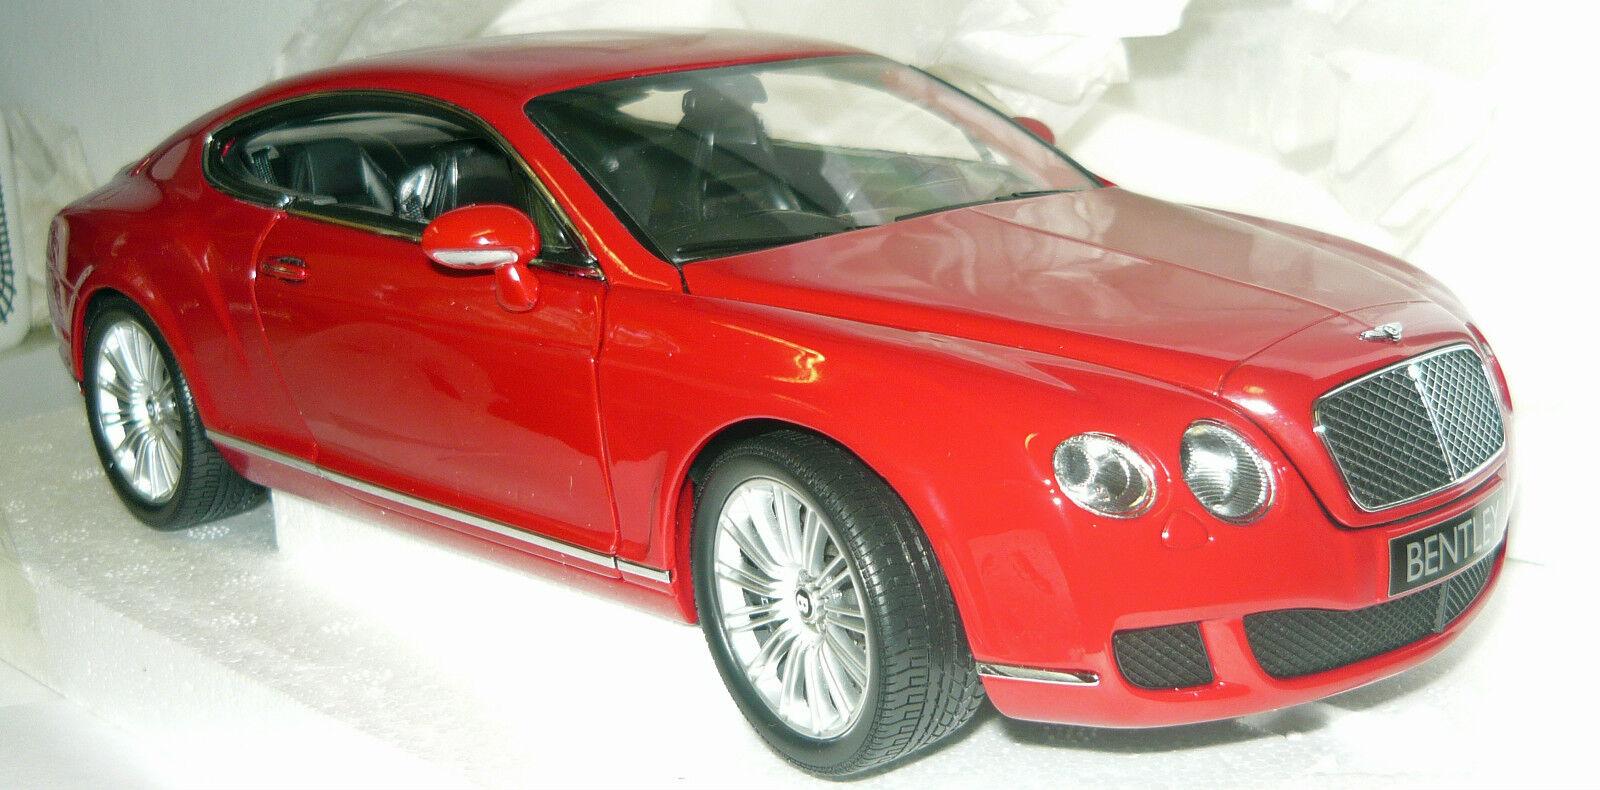 Minichamps 100139620, Bentley Continental GT 2008 rouge, 1 18, NEU&OVP